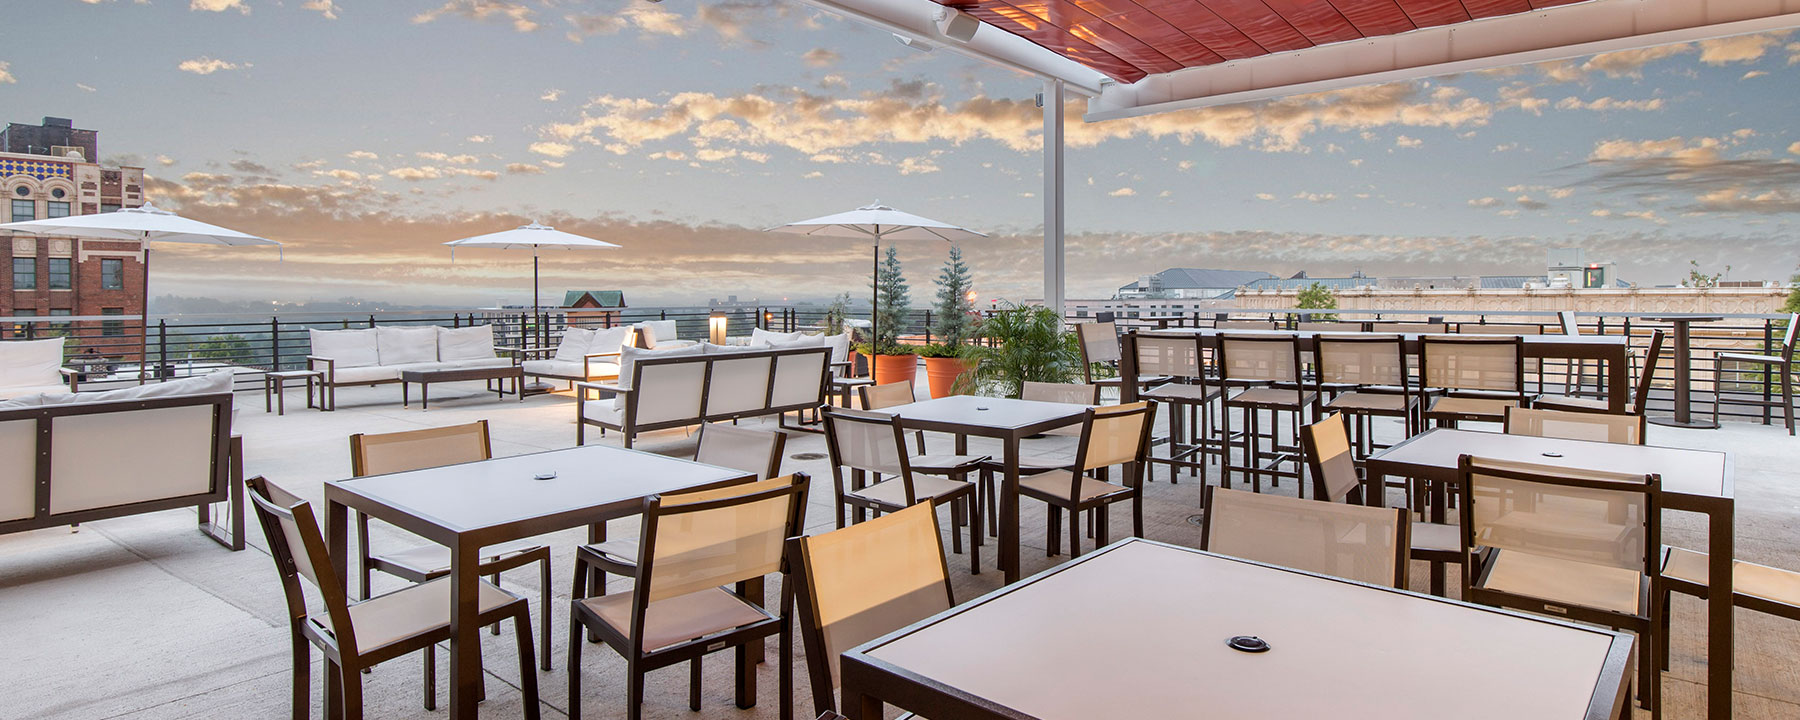 Restaurants by FIRC Group Asheville